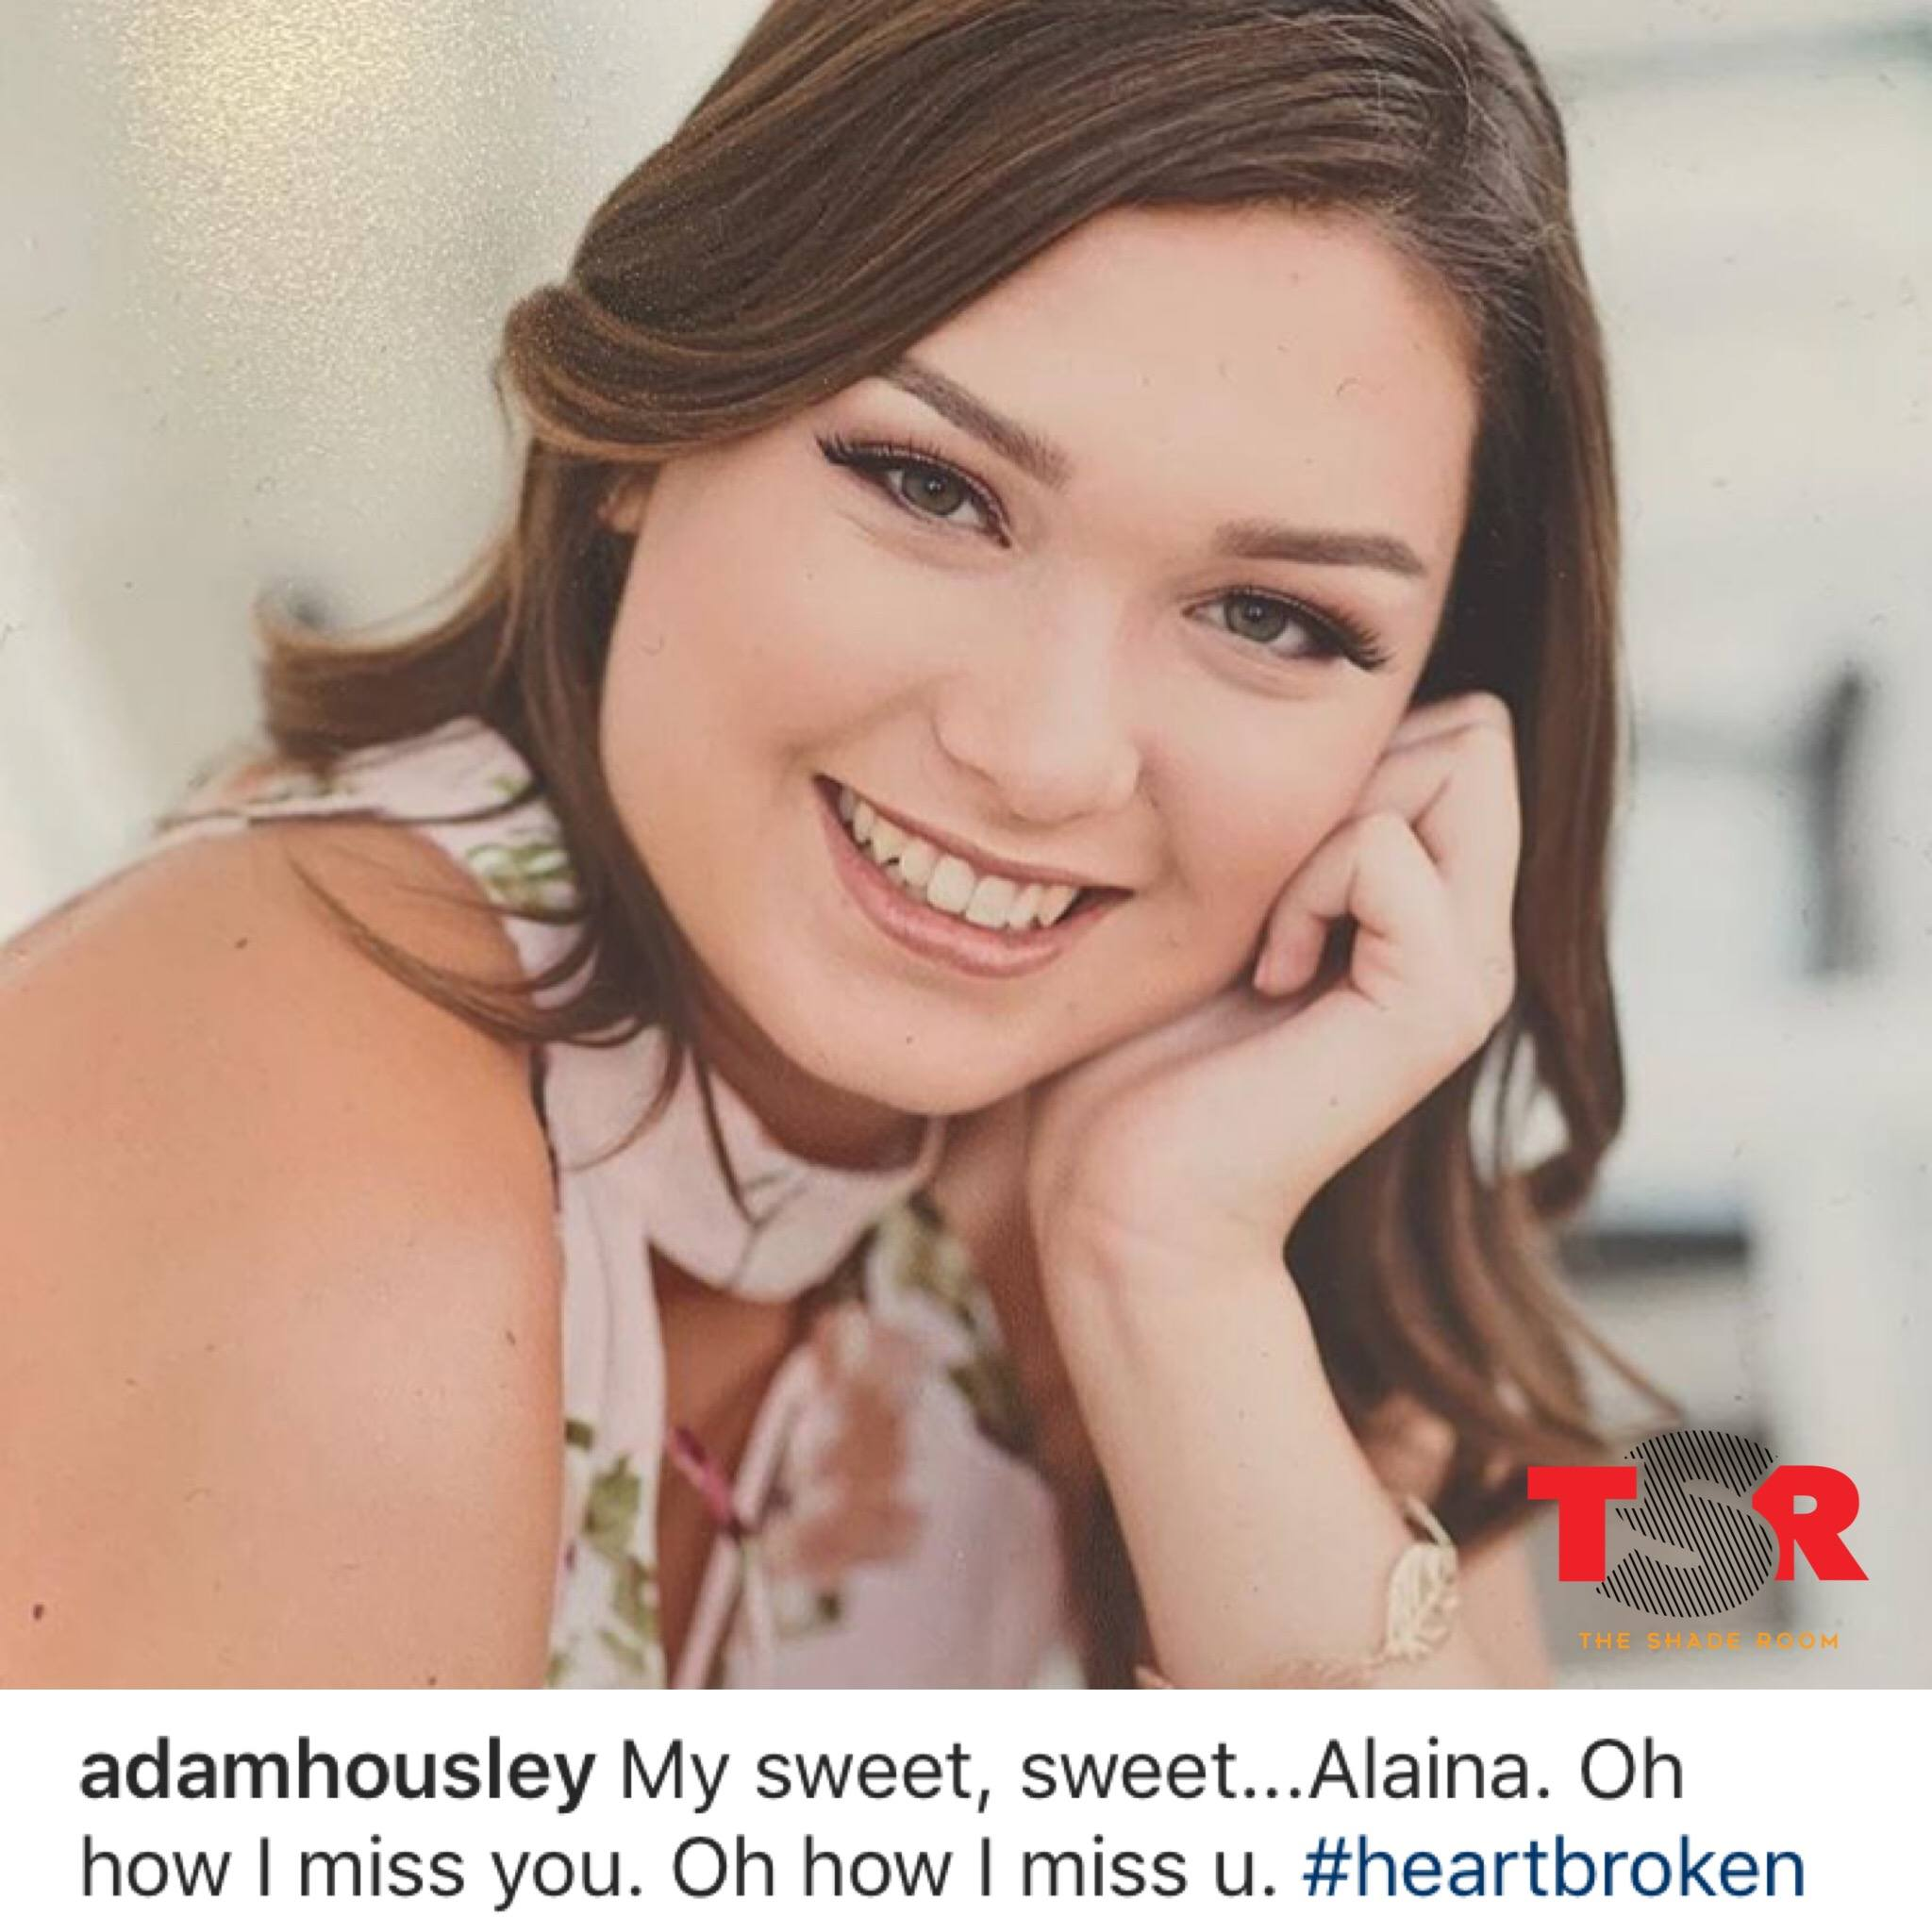 Tamera Mowry-Housley & Adam Housley Remember Their Niece Alaina